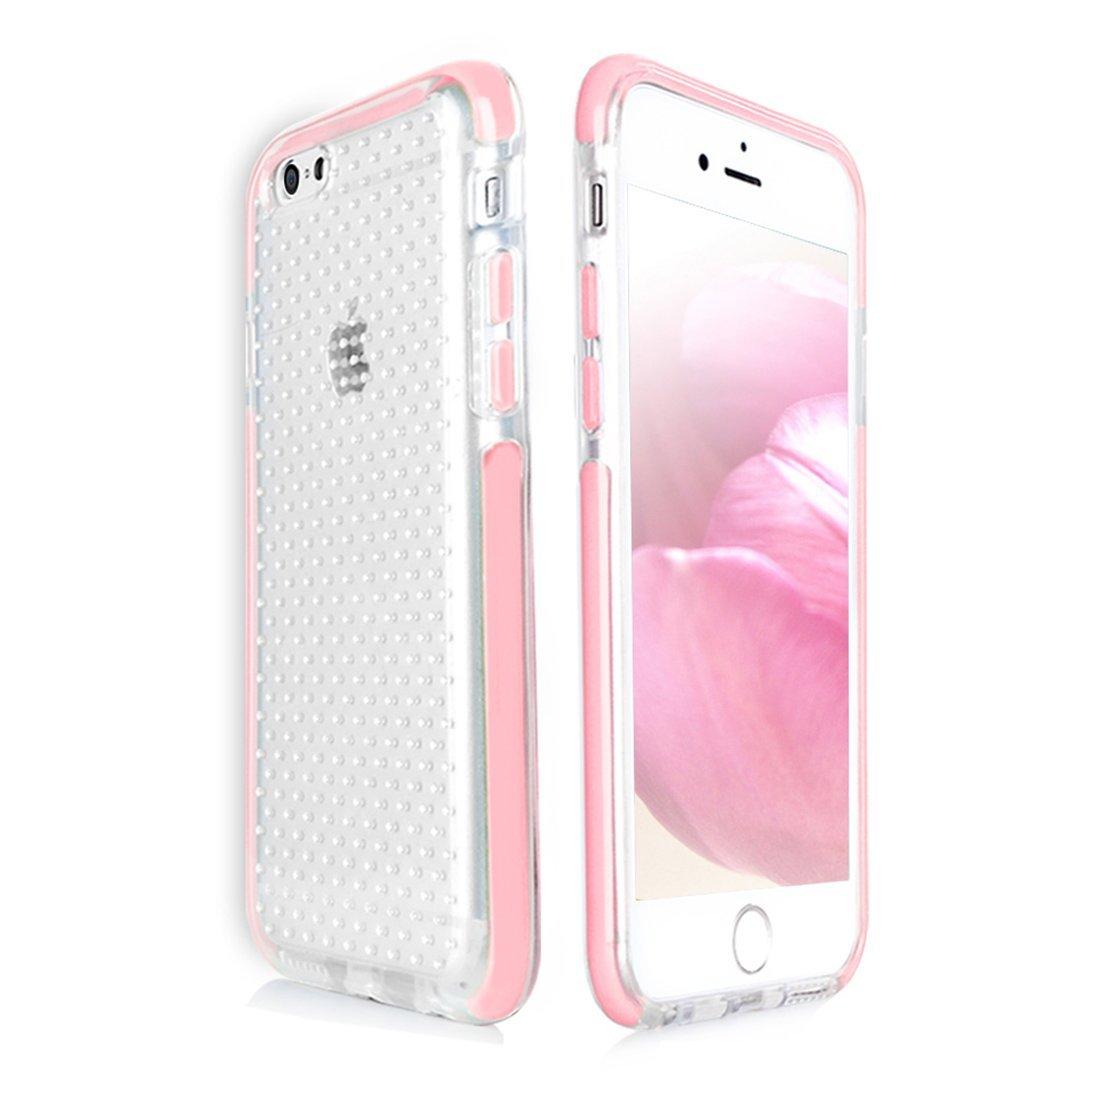 fyy iphone 6 case